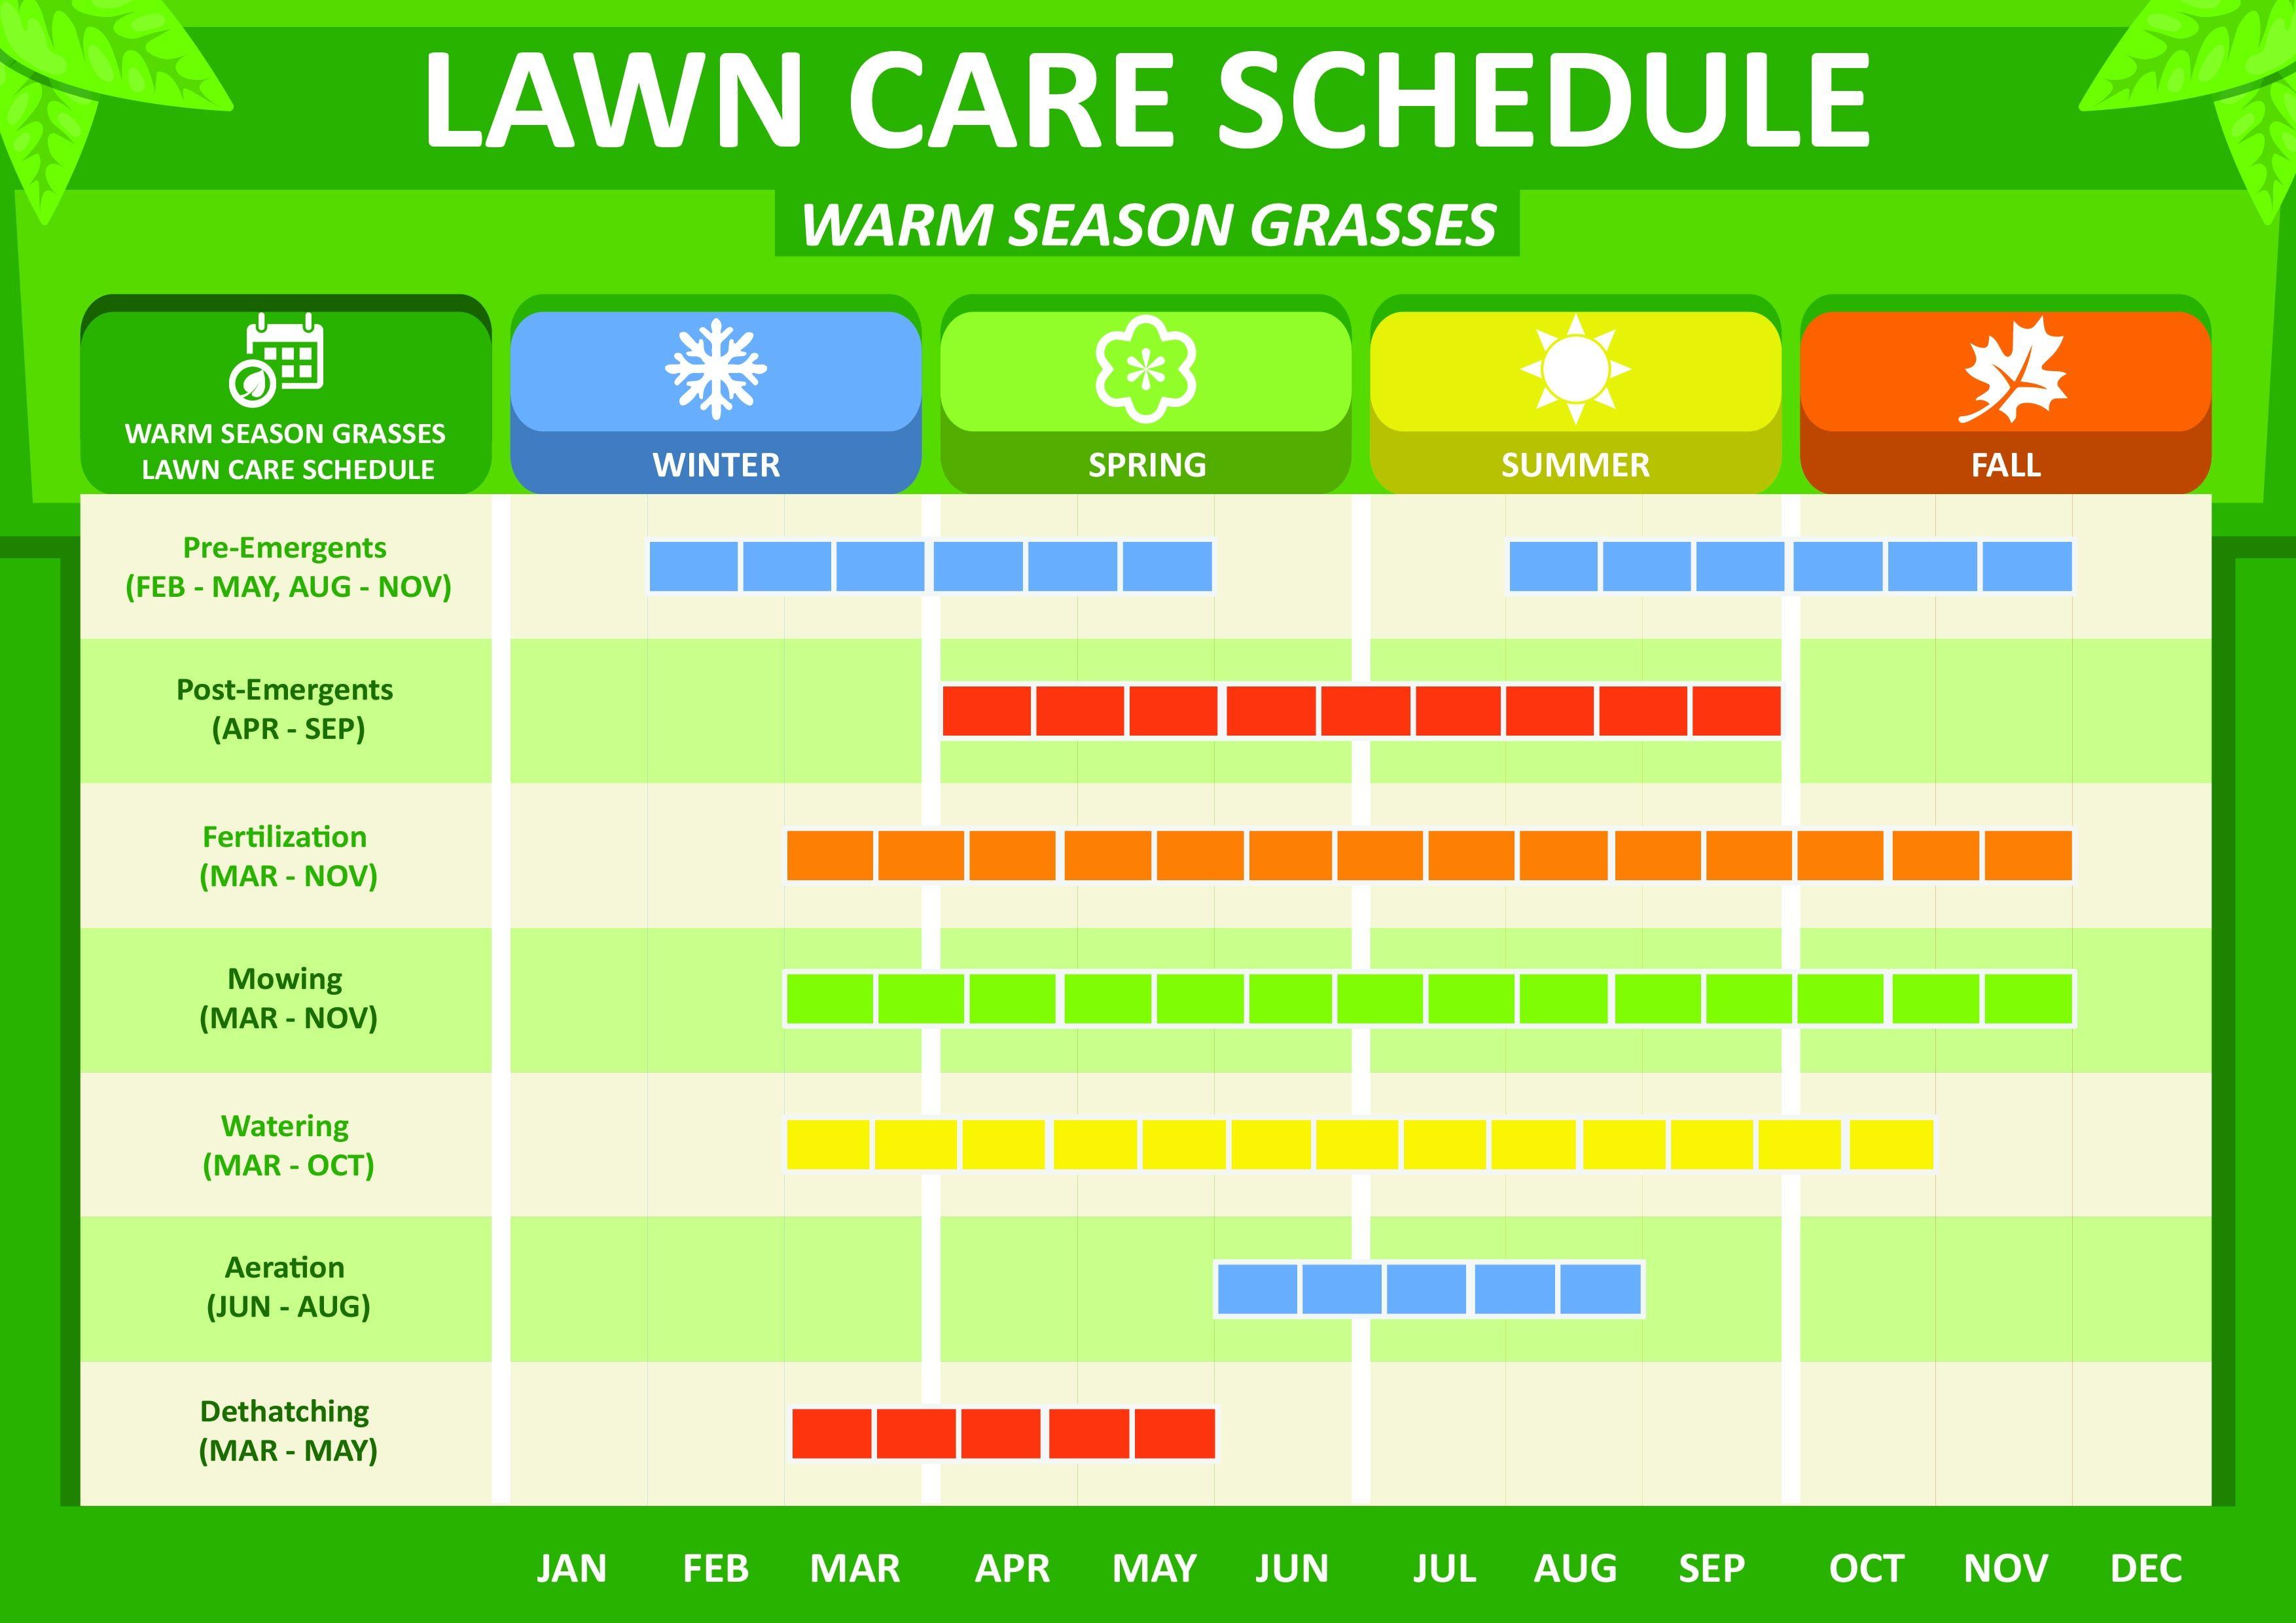 Warm Season Grass Schedule With Images Warm Season